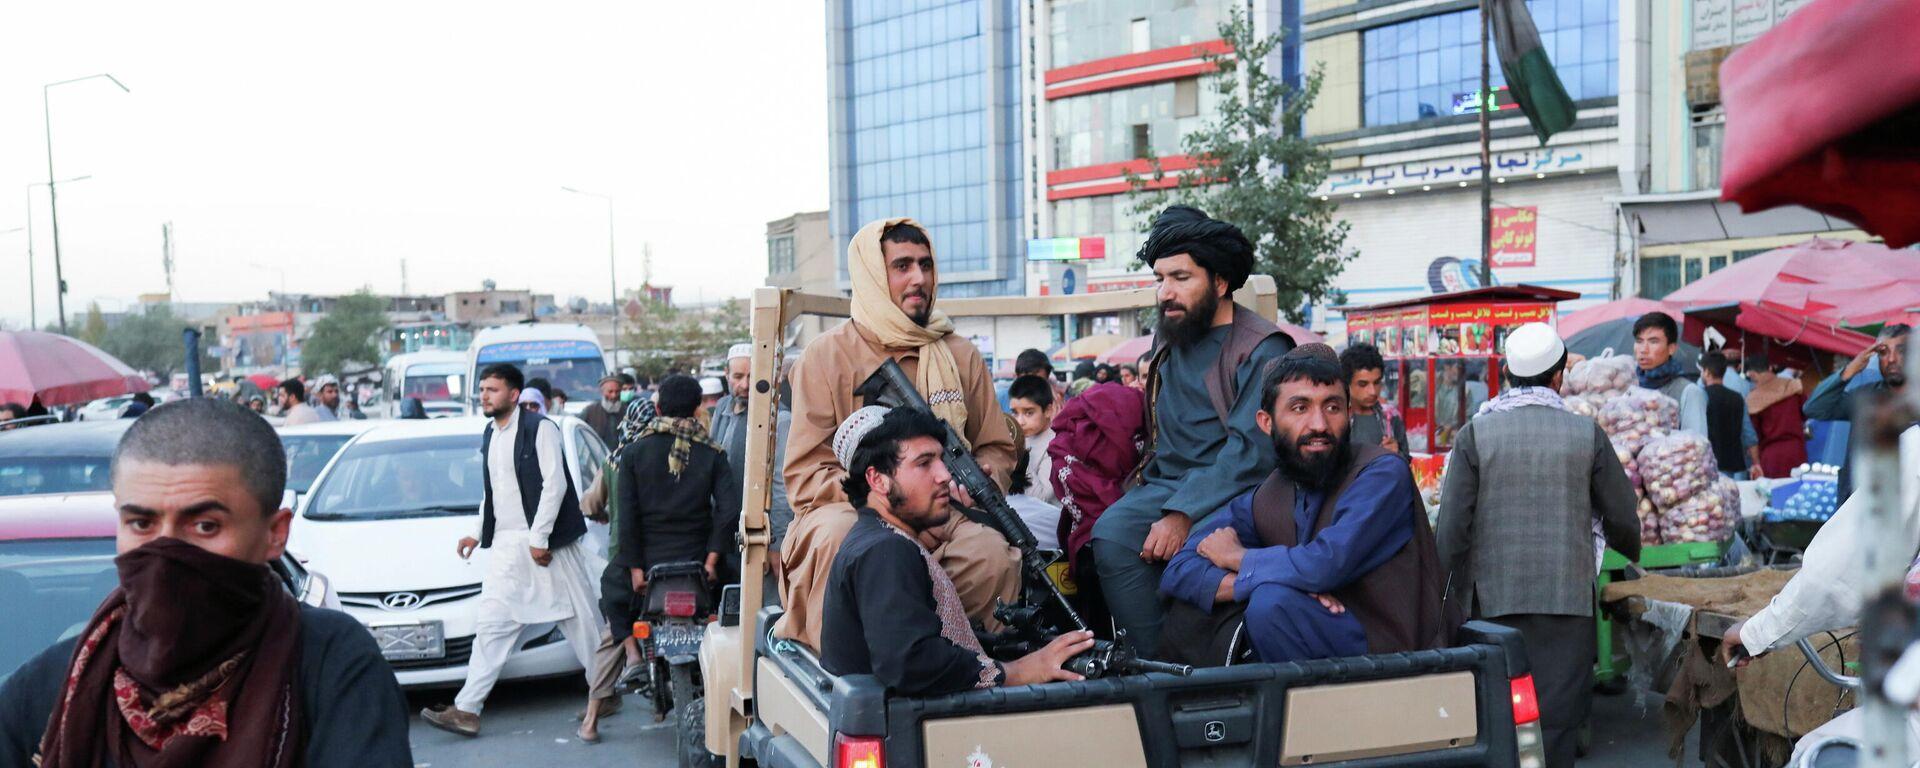 Taliban-Kämpfer in Kabul - SNA, 1920, 17.09.2021